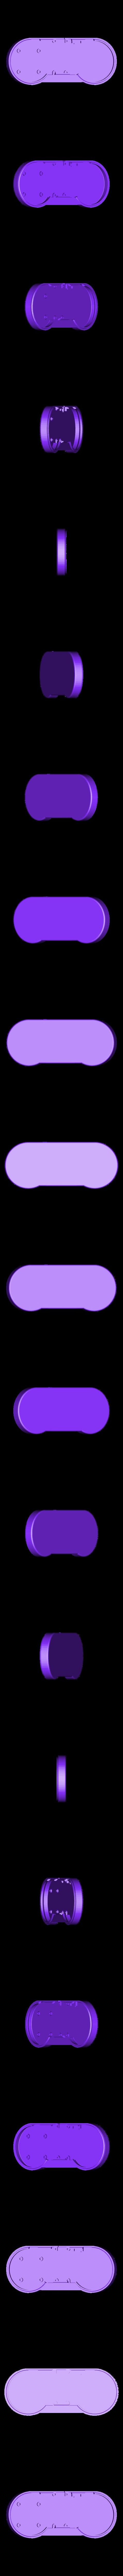 joy-bot.stl Download free STL file Joy The Gamepad Controller • 3D printable object, Adafruit